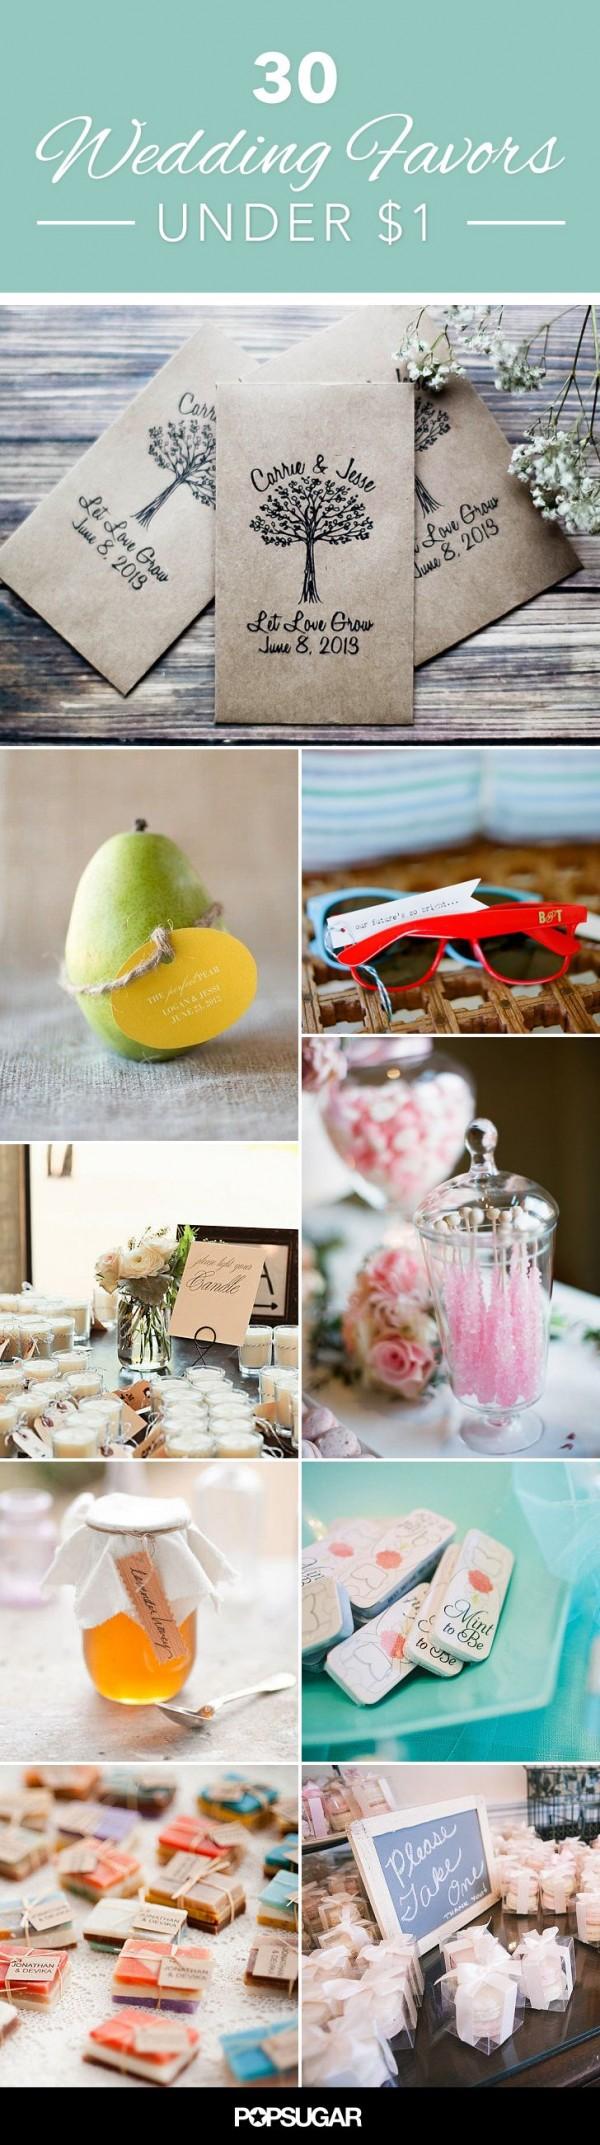 Wedding Favors Under 1 DIY Weddings